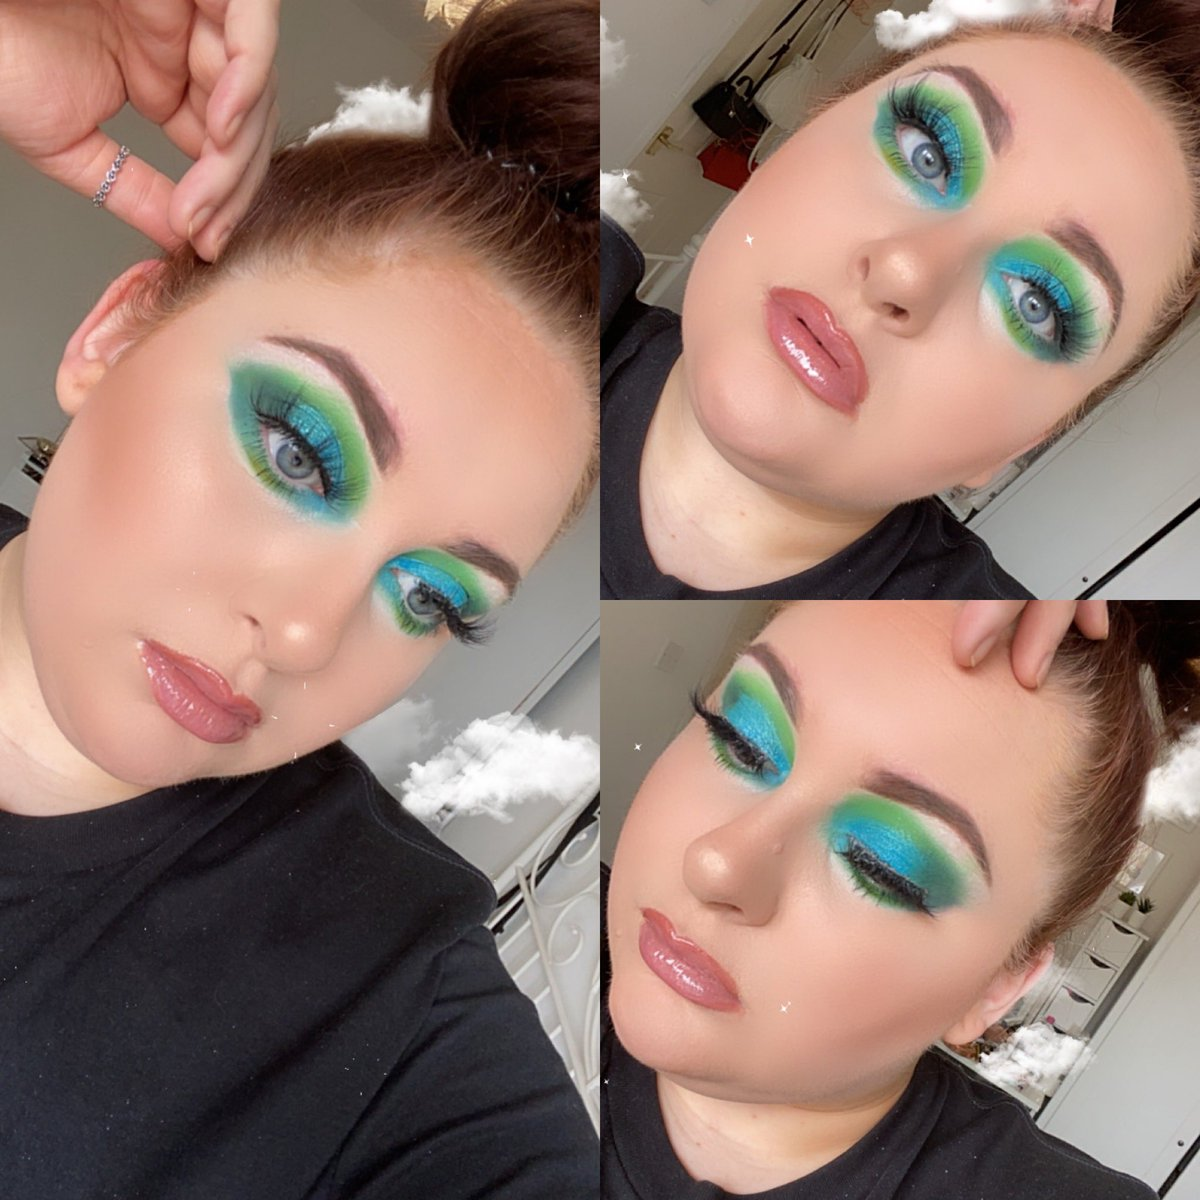 OCEAN EYES   #makeup #makeuplook #mua<br>http://pic.twitter.com/fwXPp5wSJq